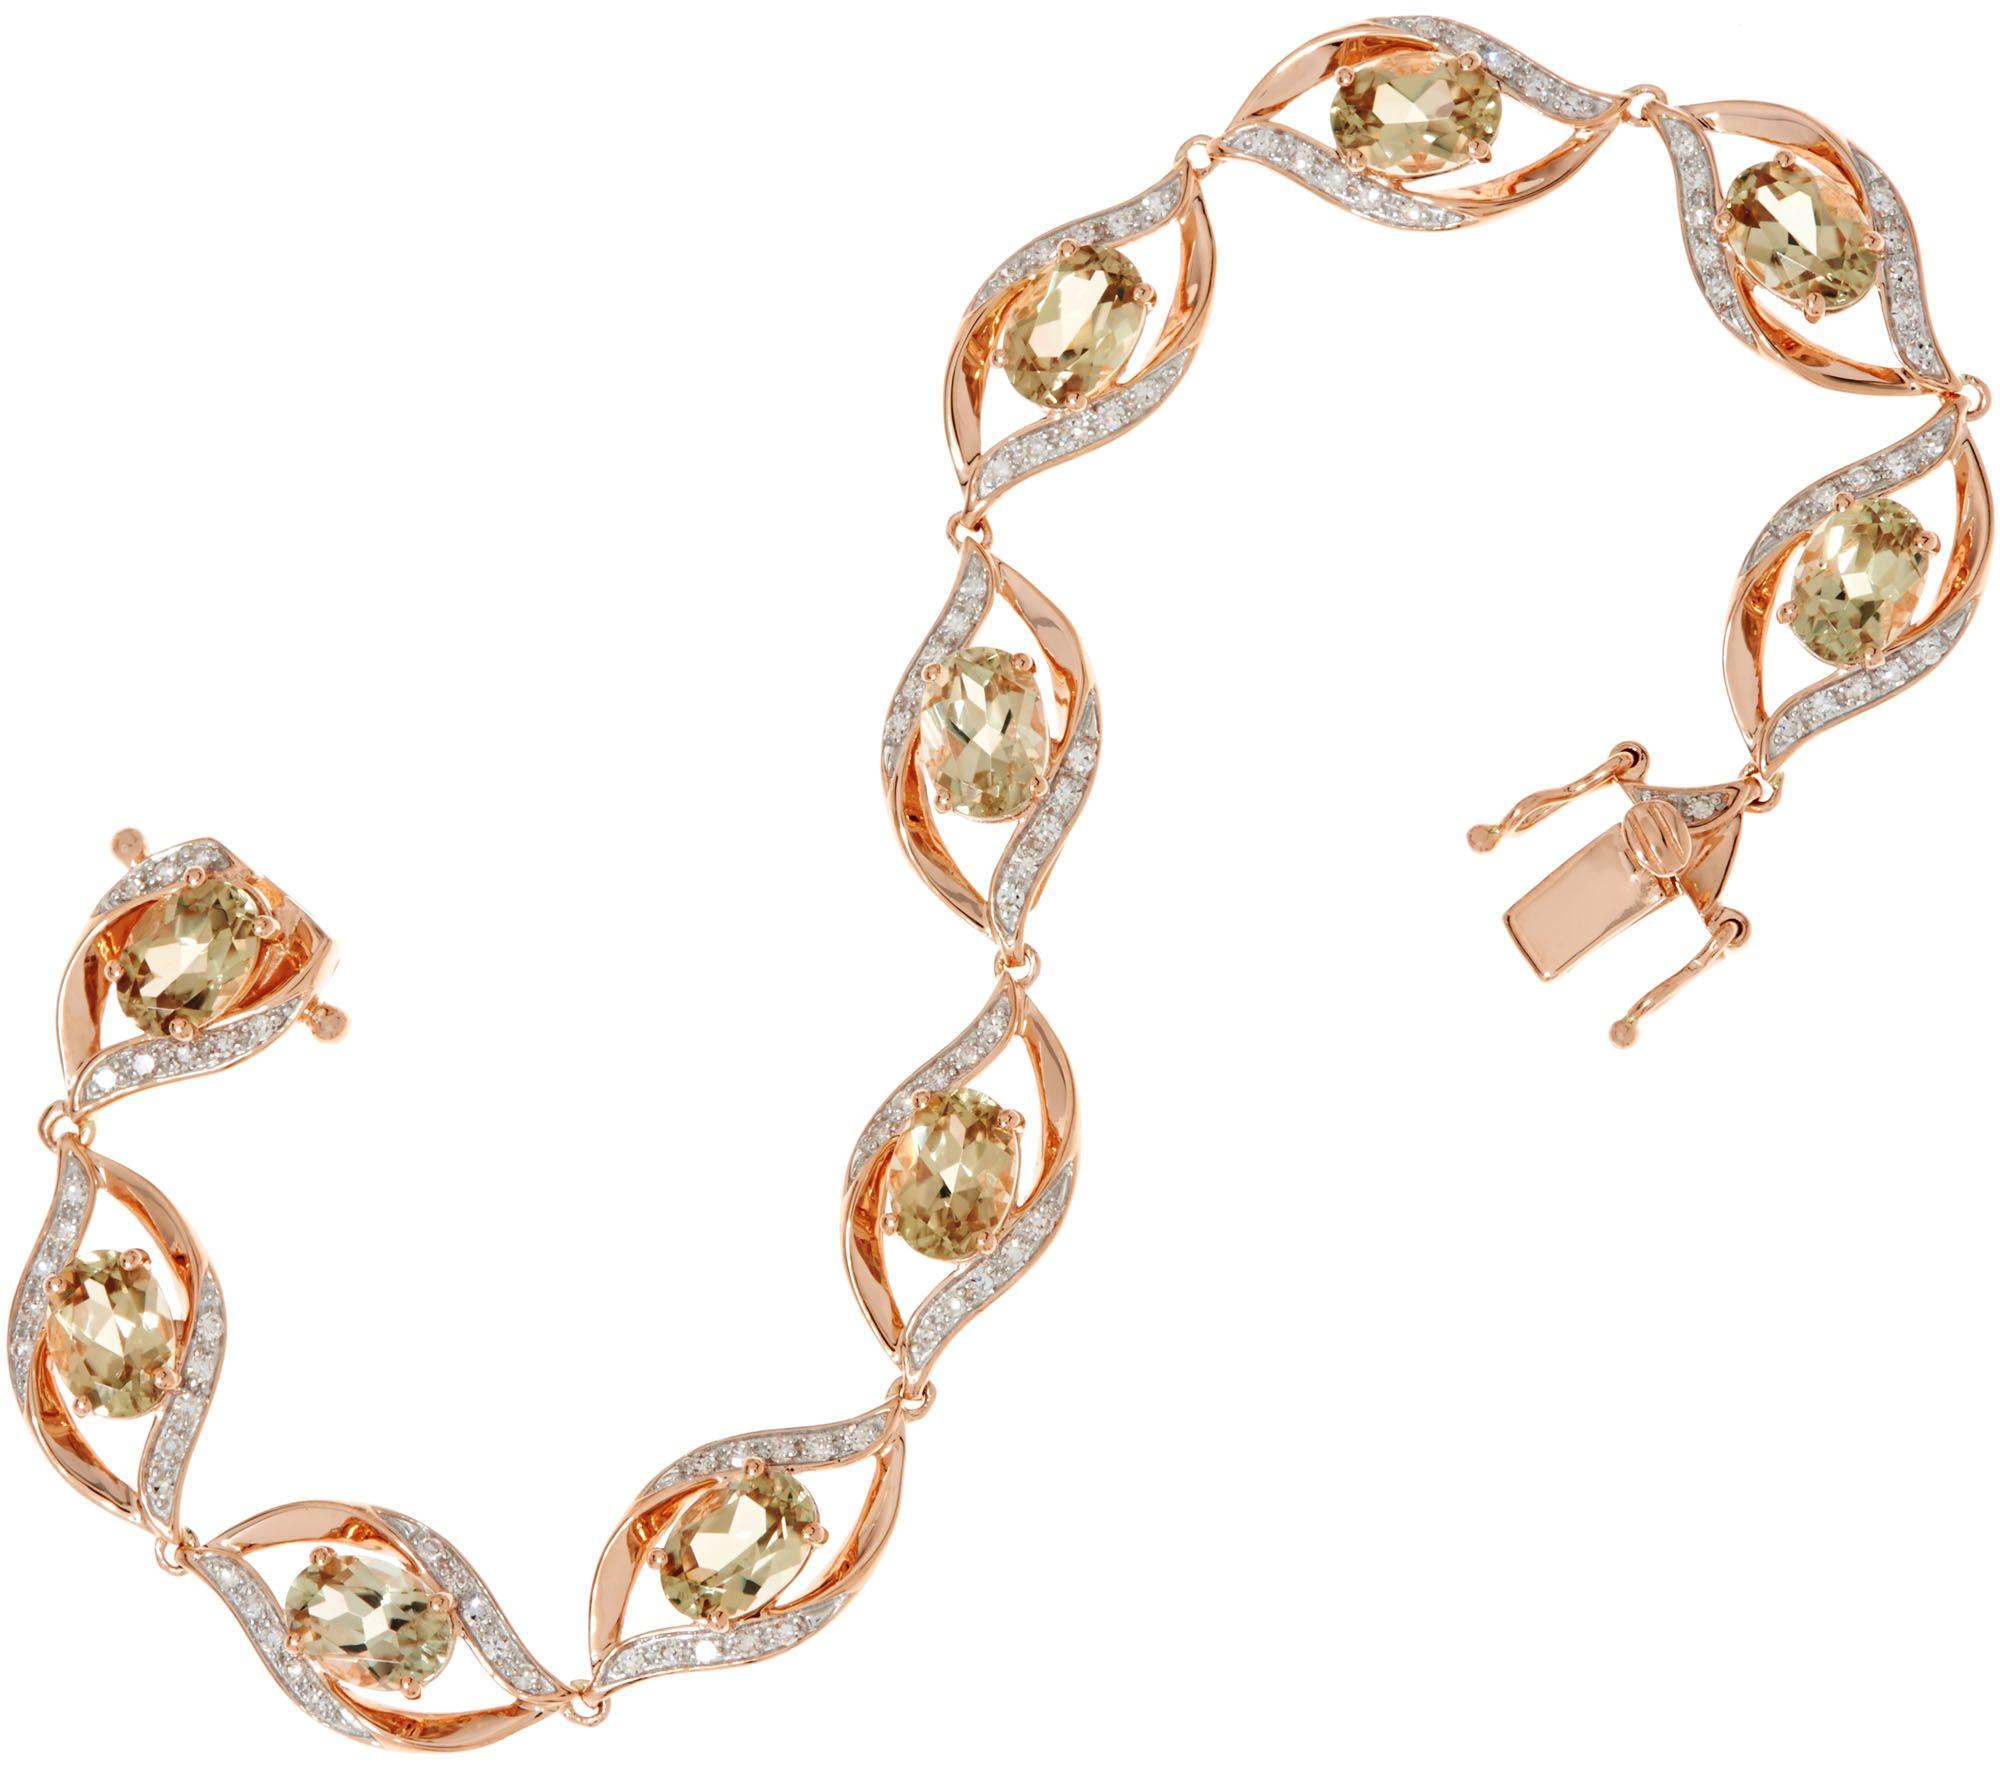 Oval Csarite Diamond Tennis Bracelet 14k Gold 6 85 Cttw Page 1 Qvc